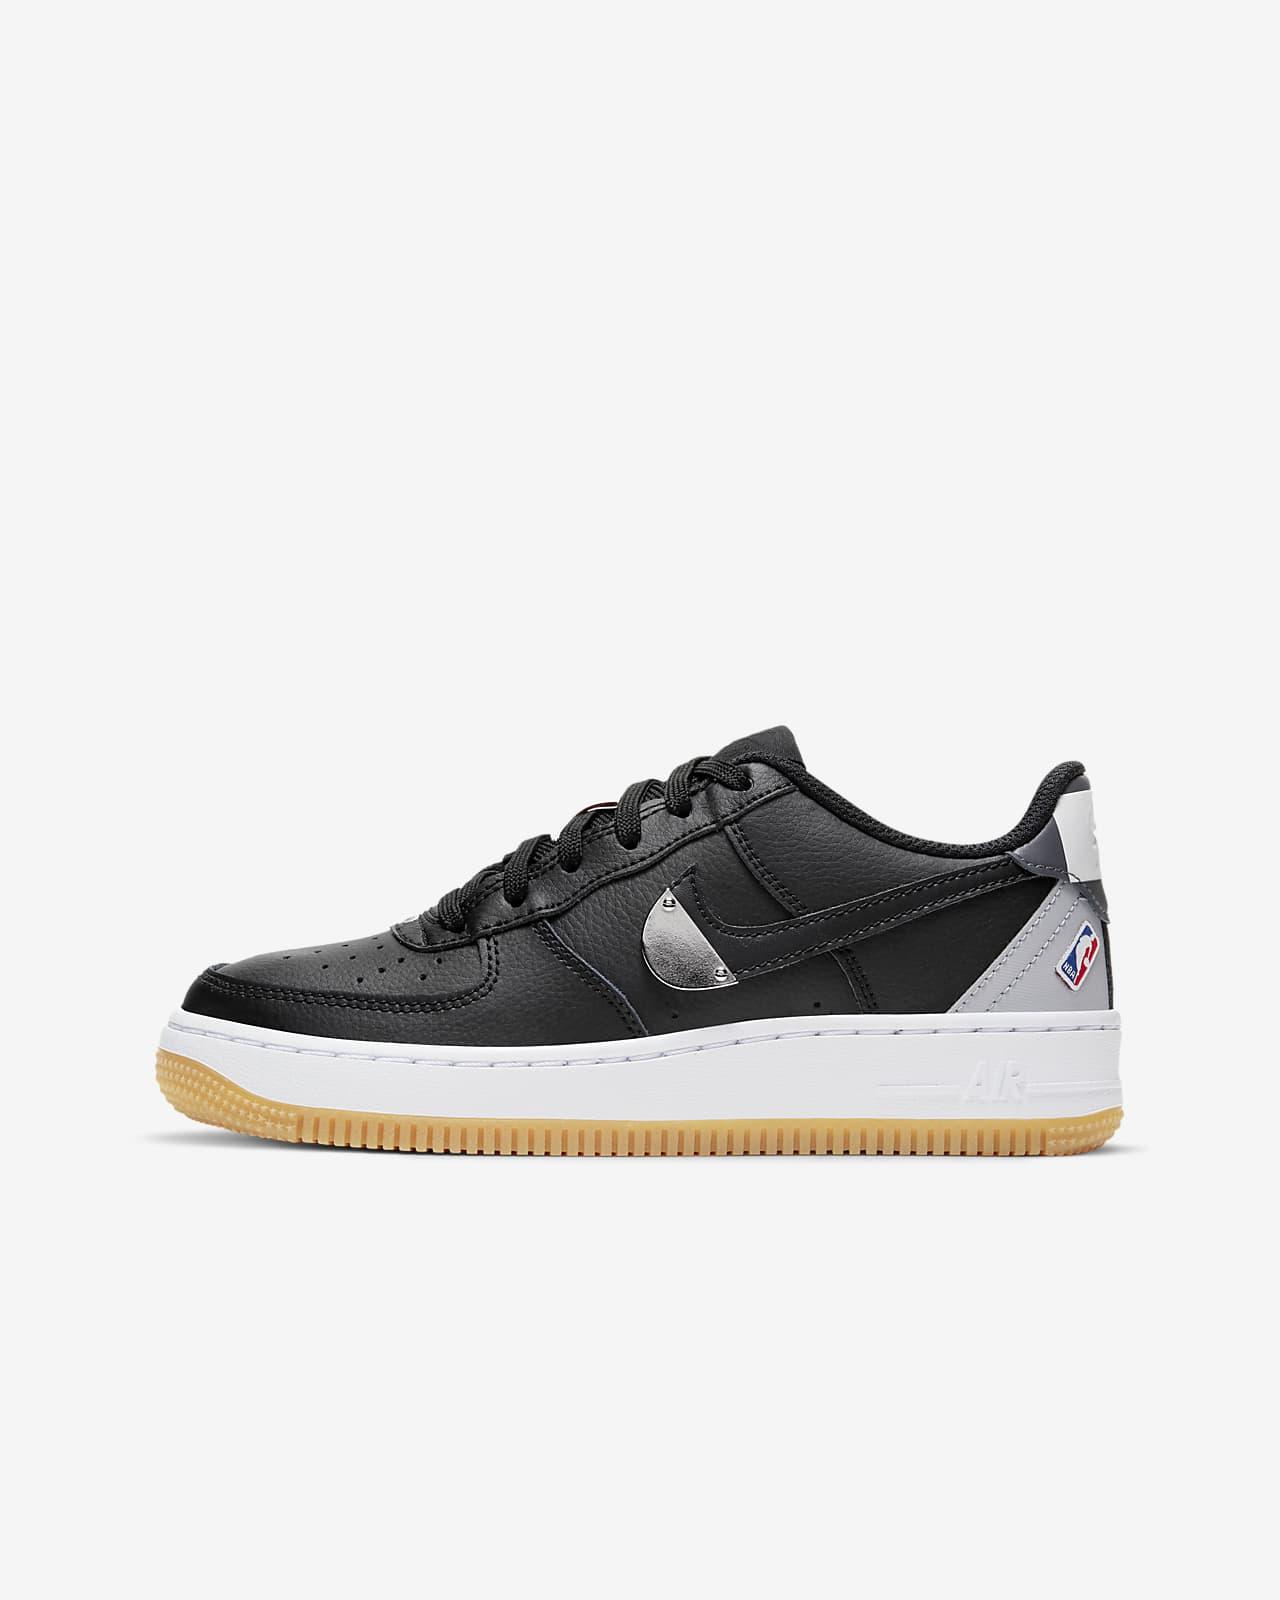 Nike Air Force 1 LV8 1 Schuh für ältere Kinder